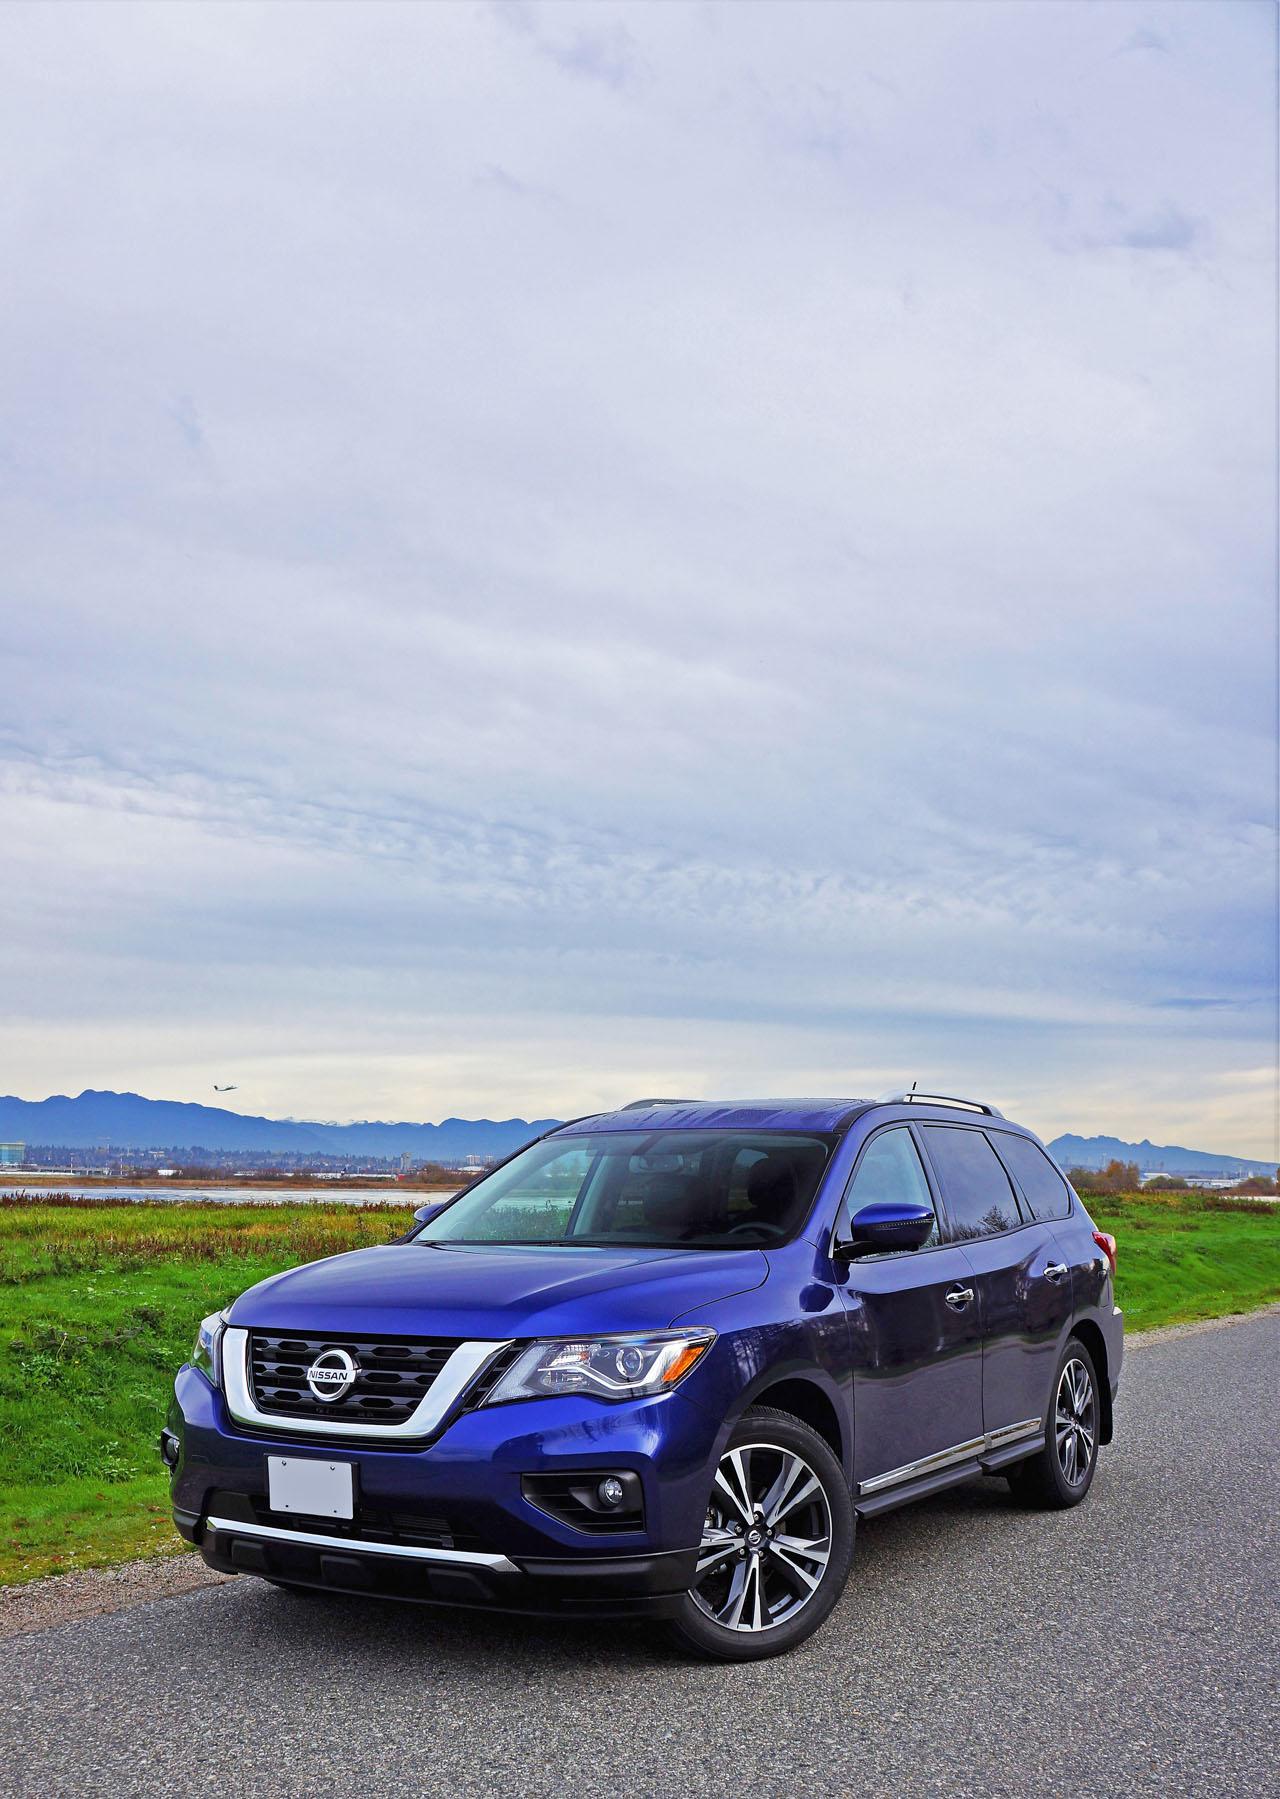 2017 Nissan Pathfinder Platinum 4x4 Road Test Review | CarCostCanada™